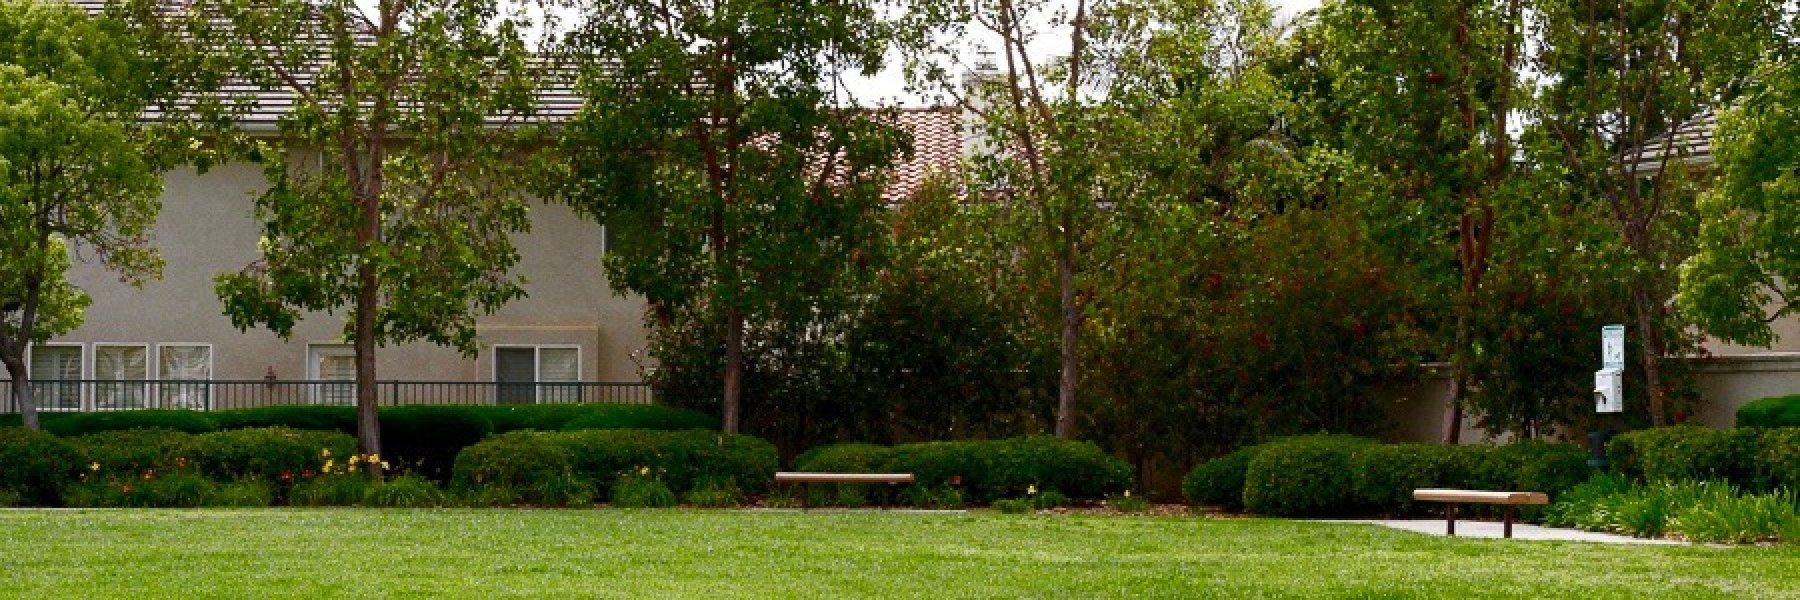 Bernardo Point is a community of homes in Rancho Bernardo California